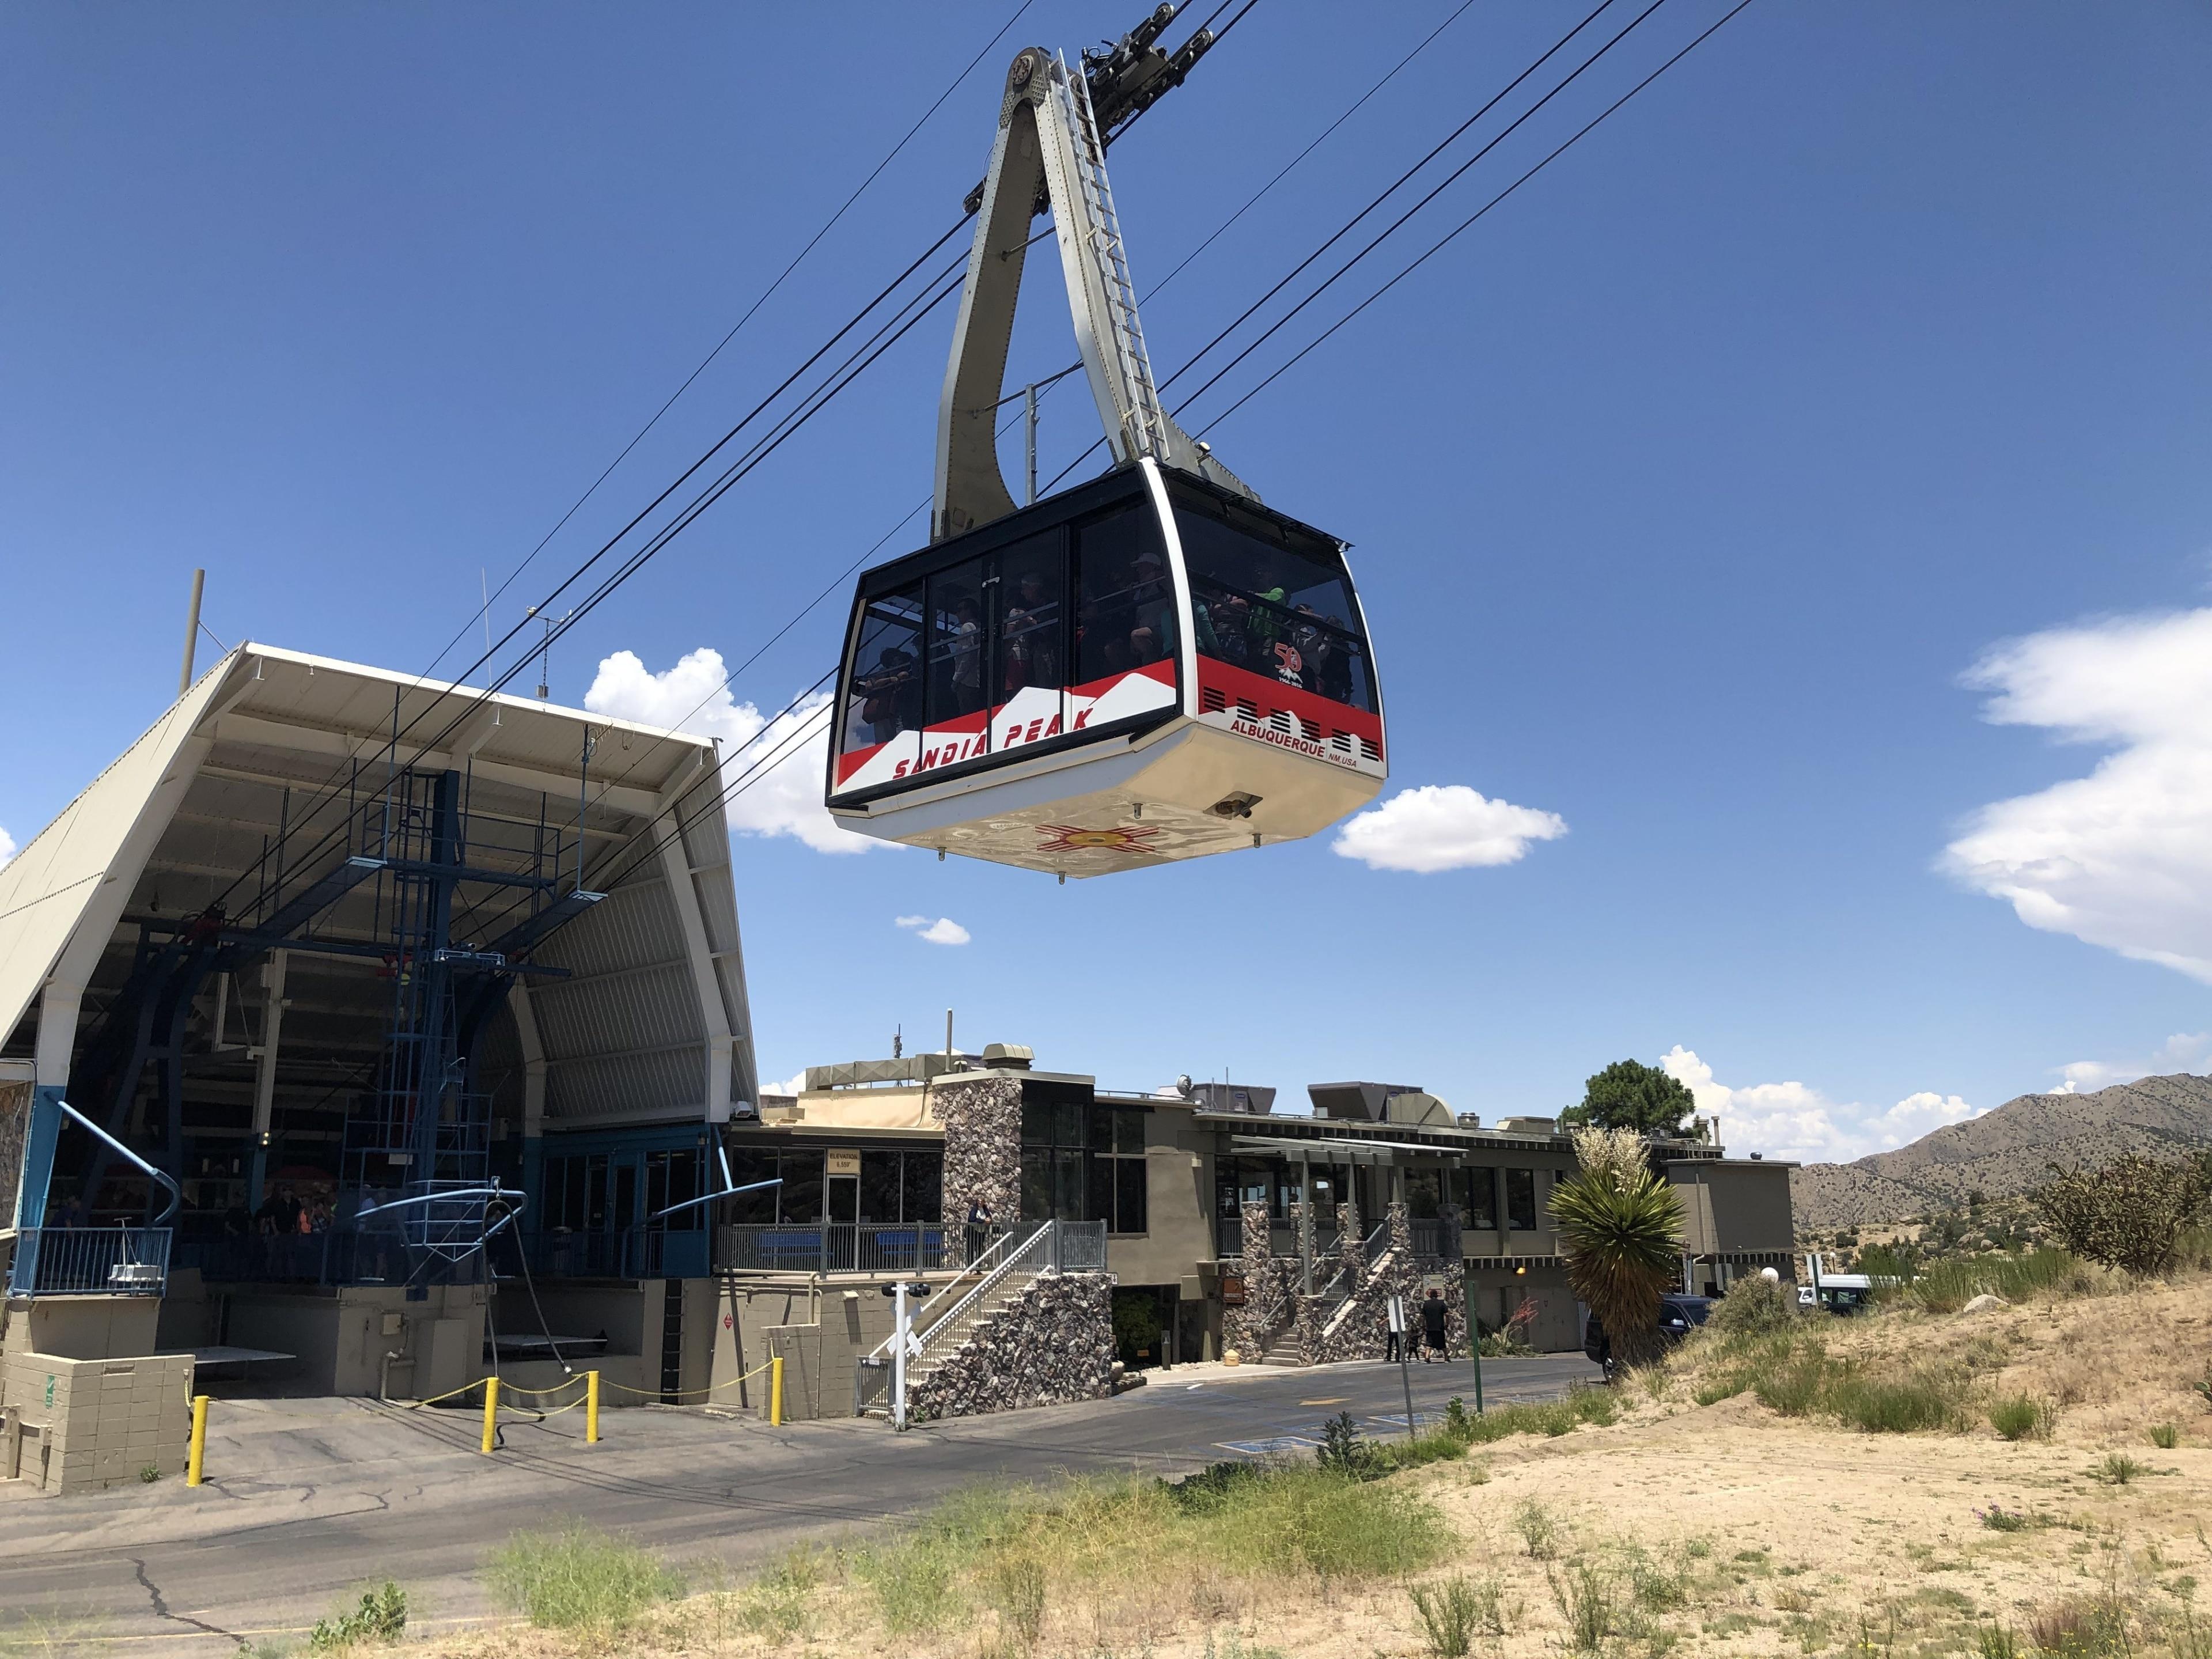 Sandia Peak Ski and Tramway, Albuquerque, New Mexico, United States of America